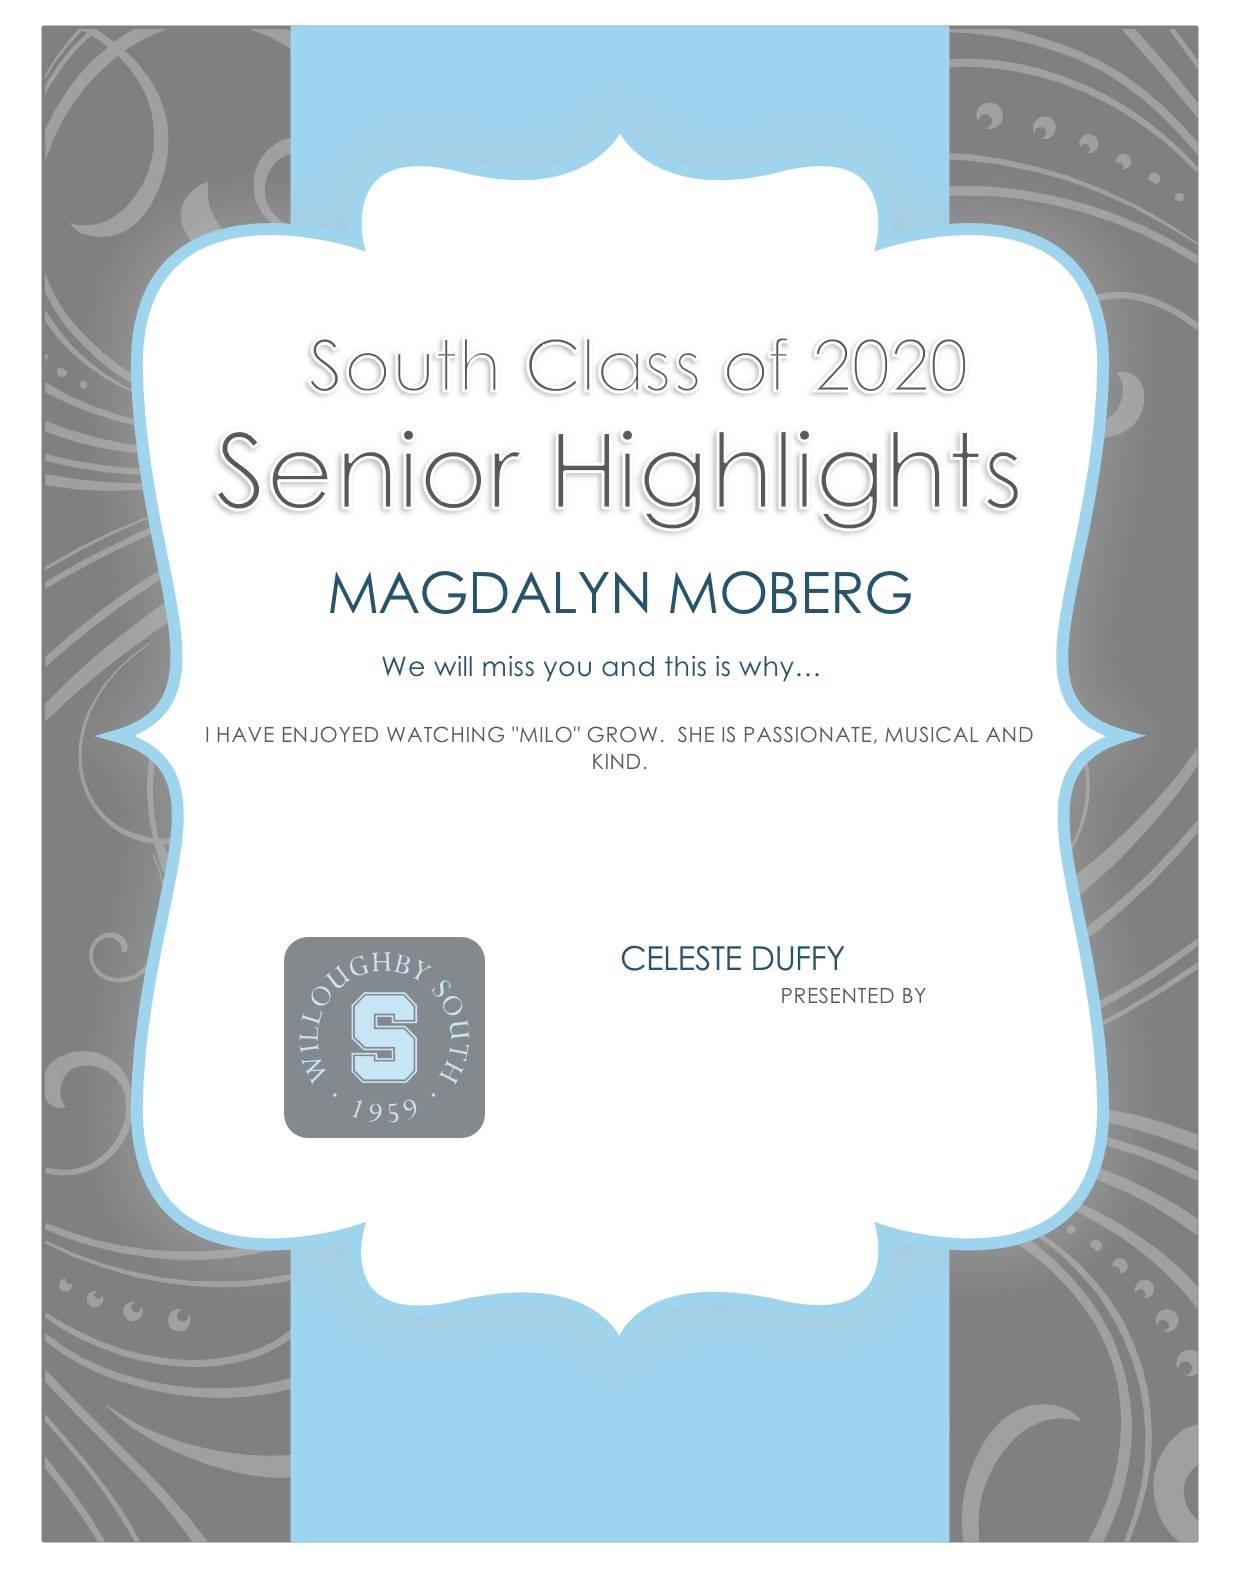 Magdalyn Moberg